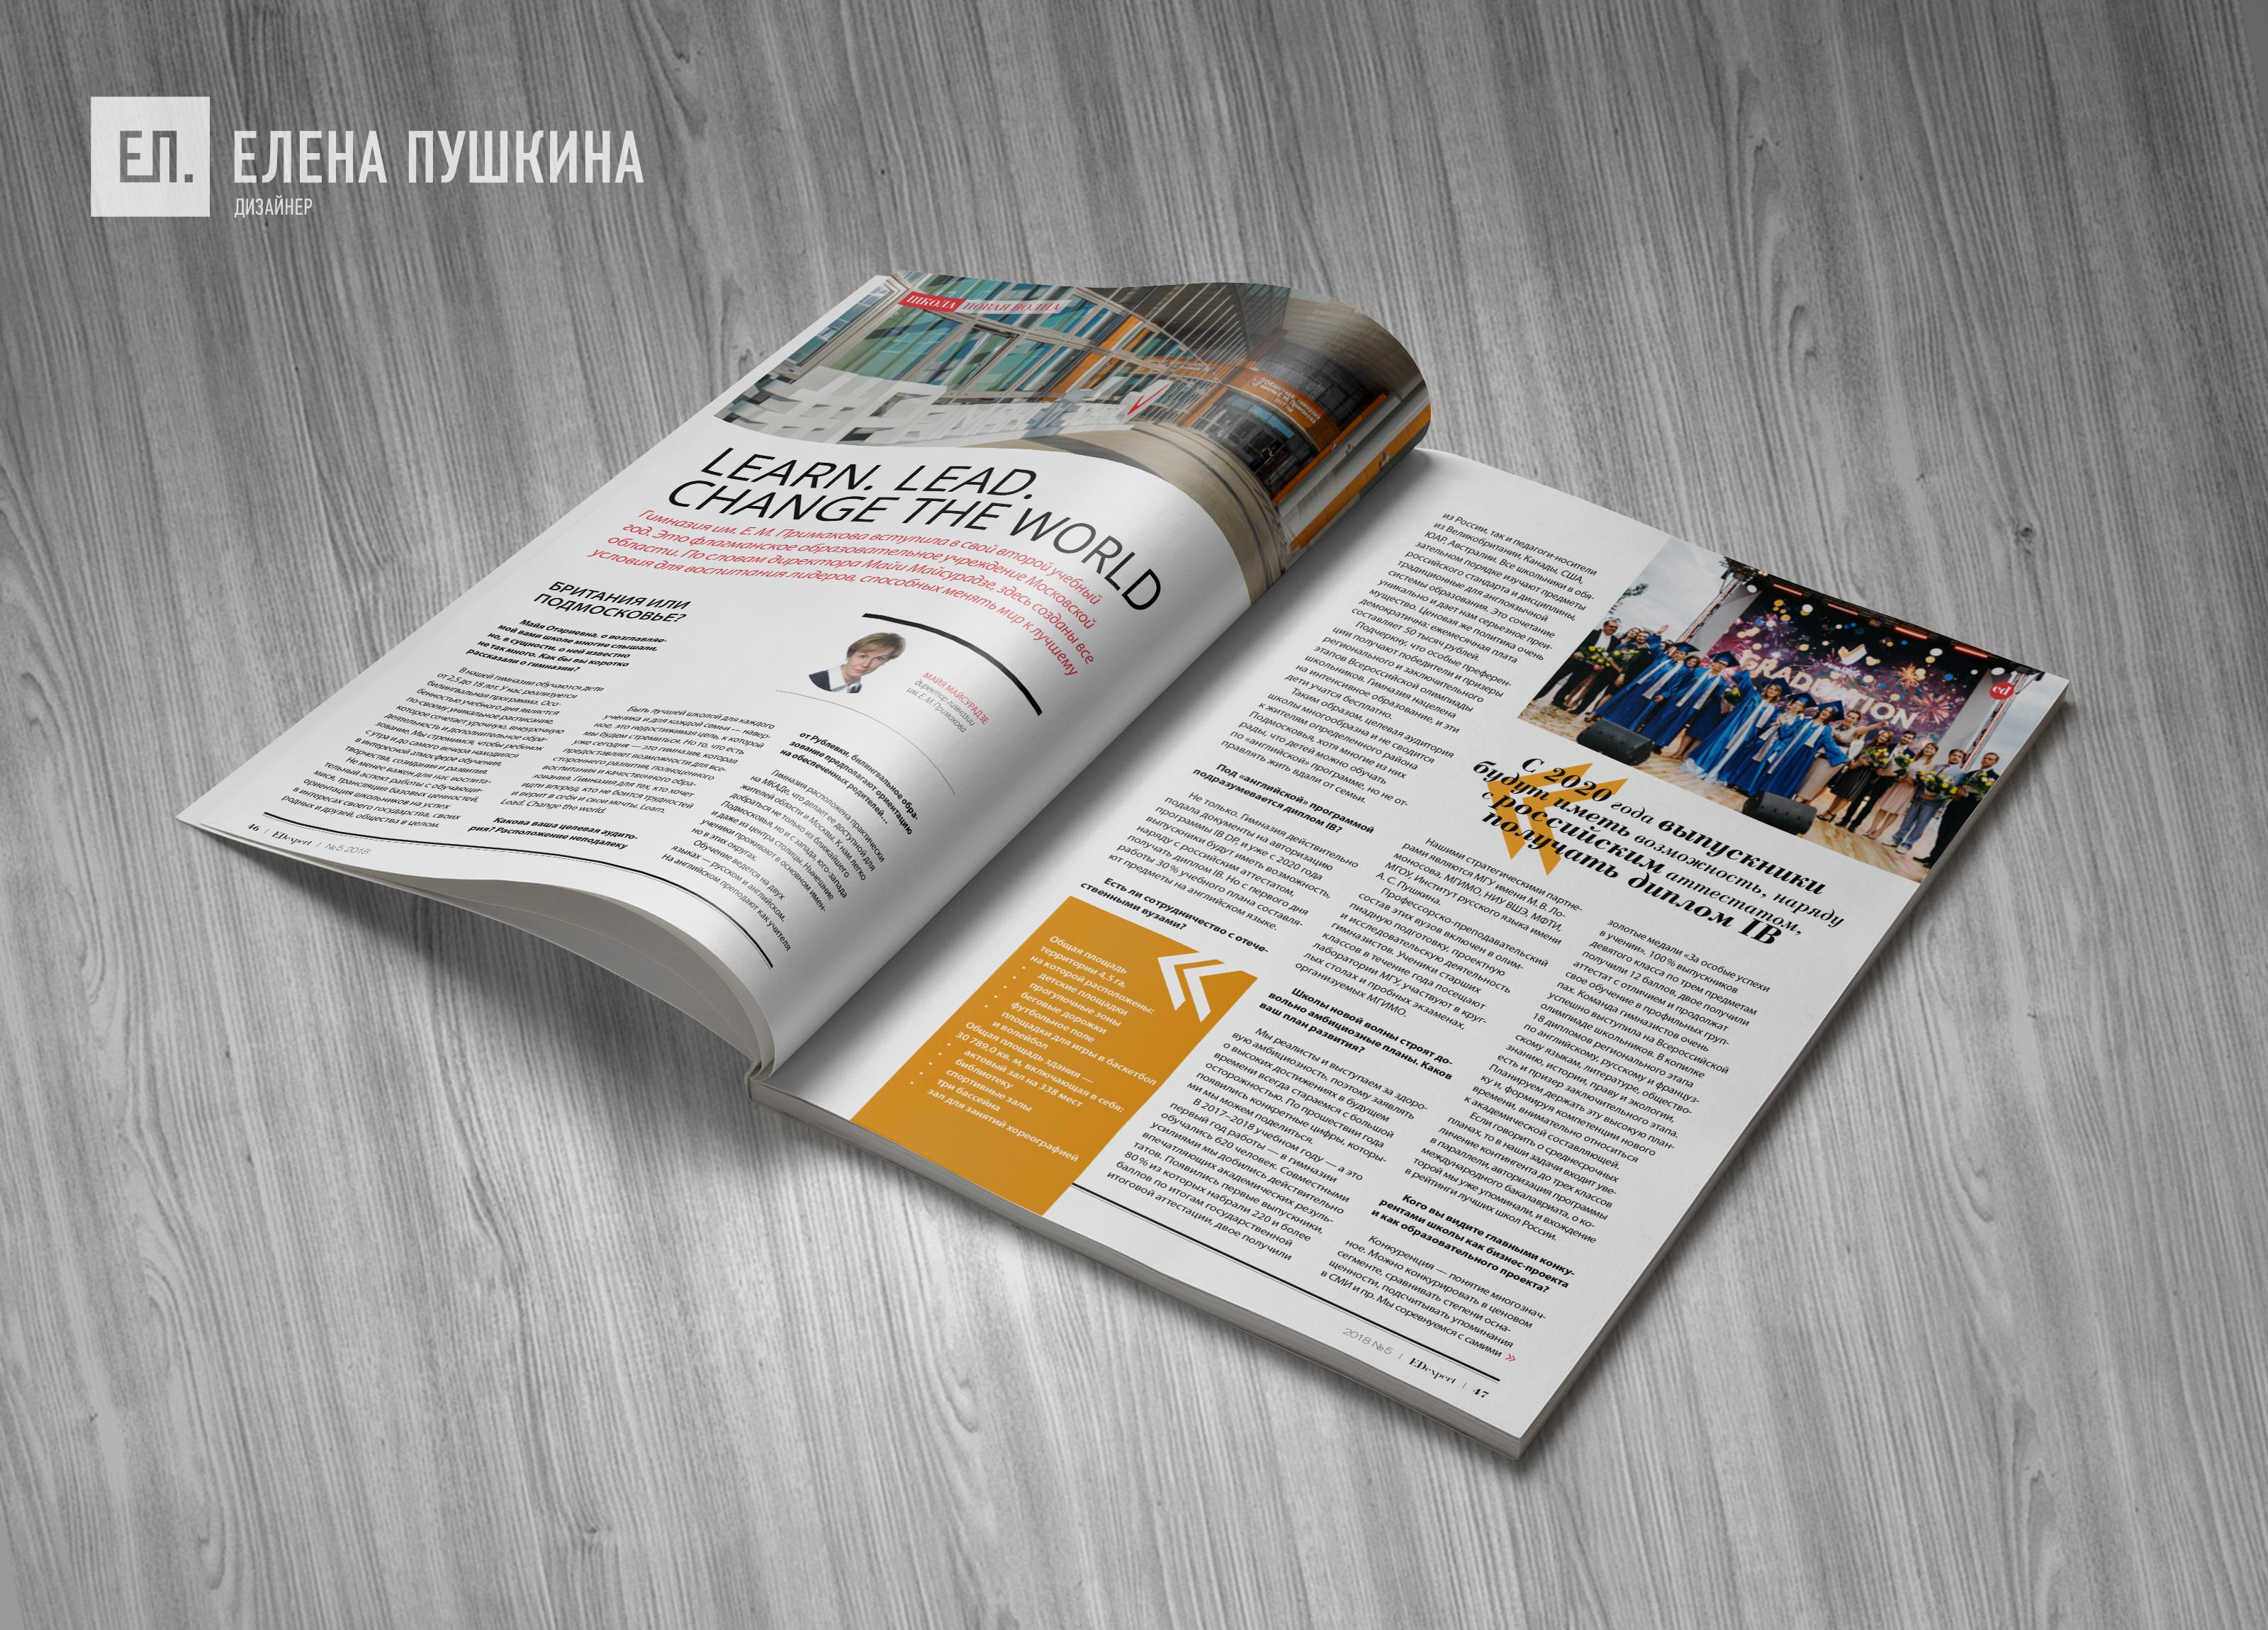 Журнал «EDexpert» №5 август 2018 — разработка с «нуля» логотипа, обложки, макета и вёрстка журнала Разработка журналов Портфолио